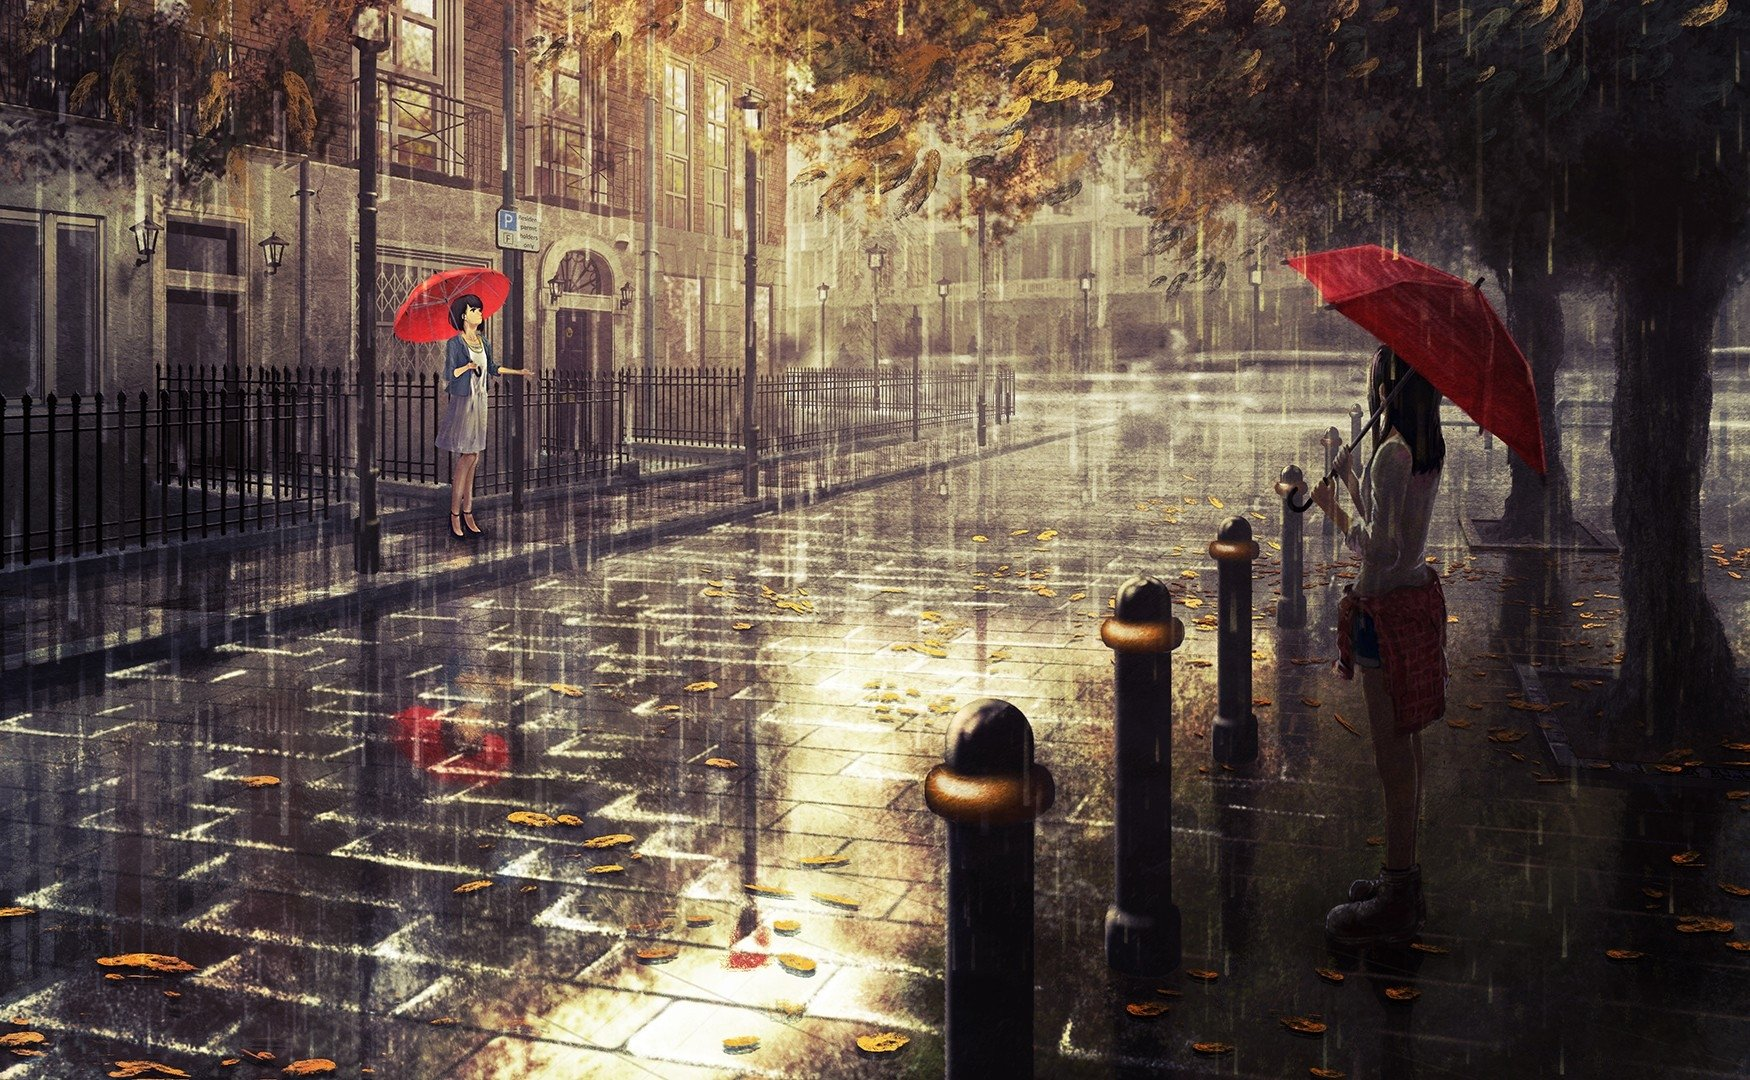 Hd wallpaper rain - Hd Wallpaper Background Id 682961